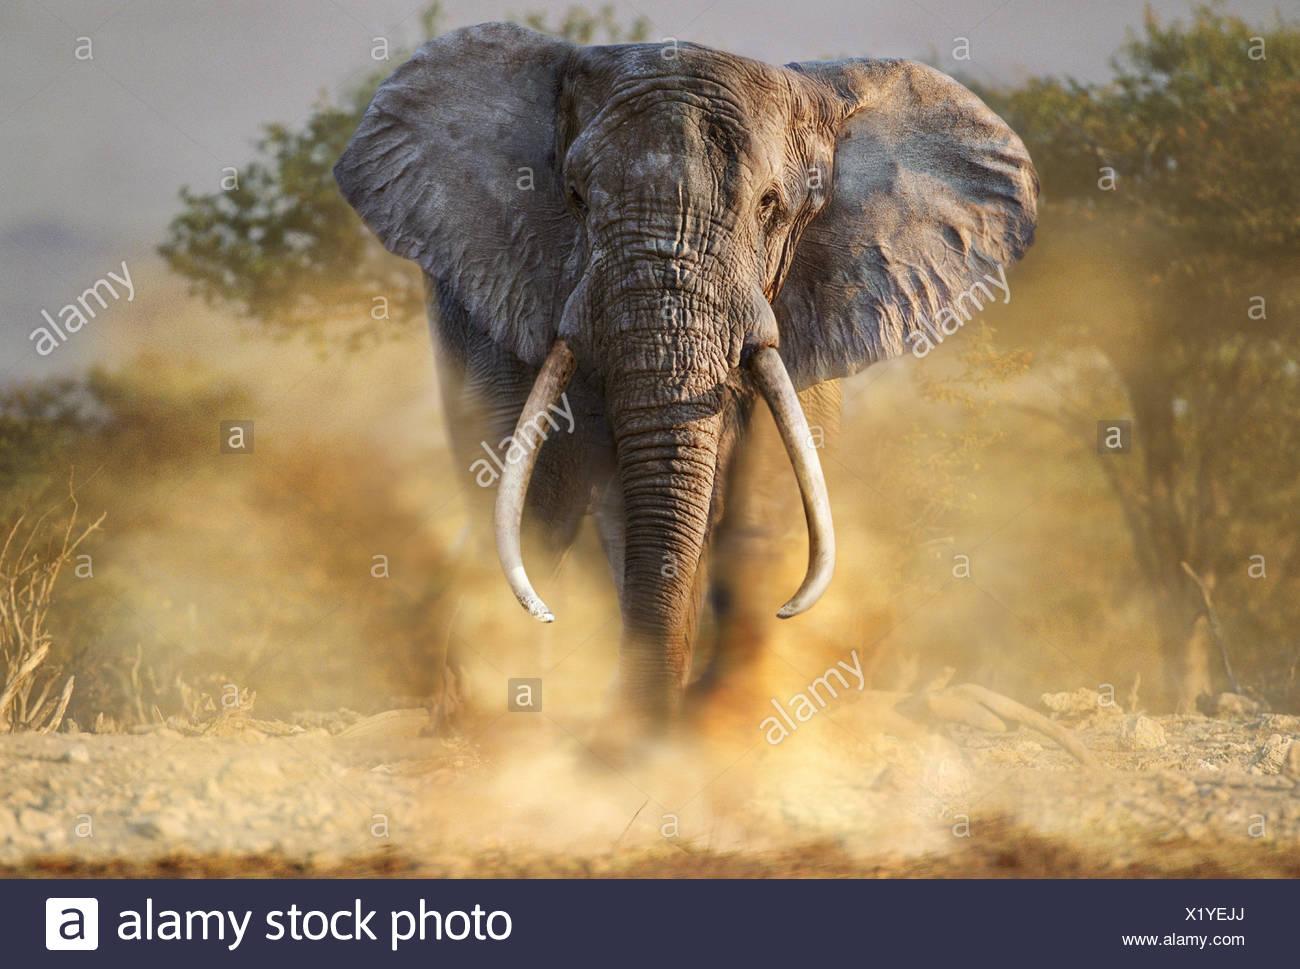 Charging African elephant - Stock Image